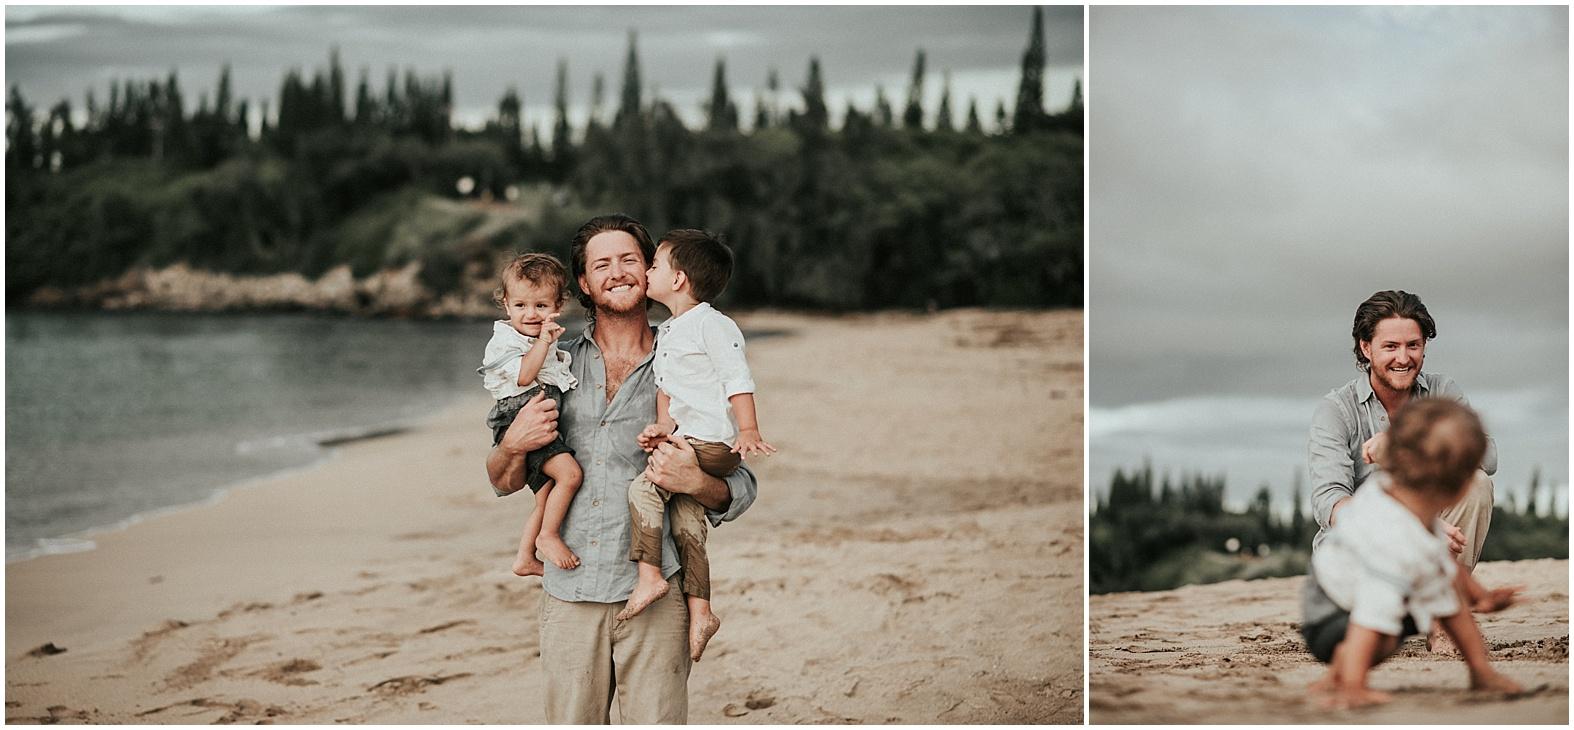 Maui family photography5.jpg